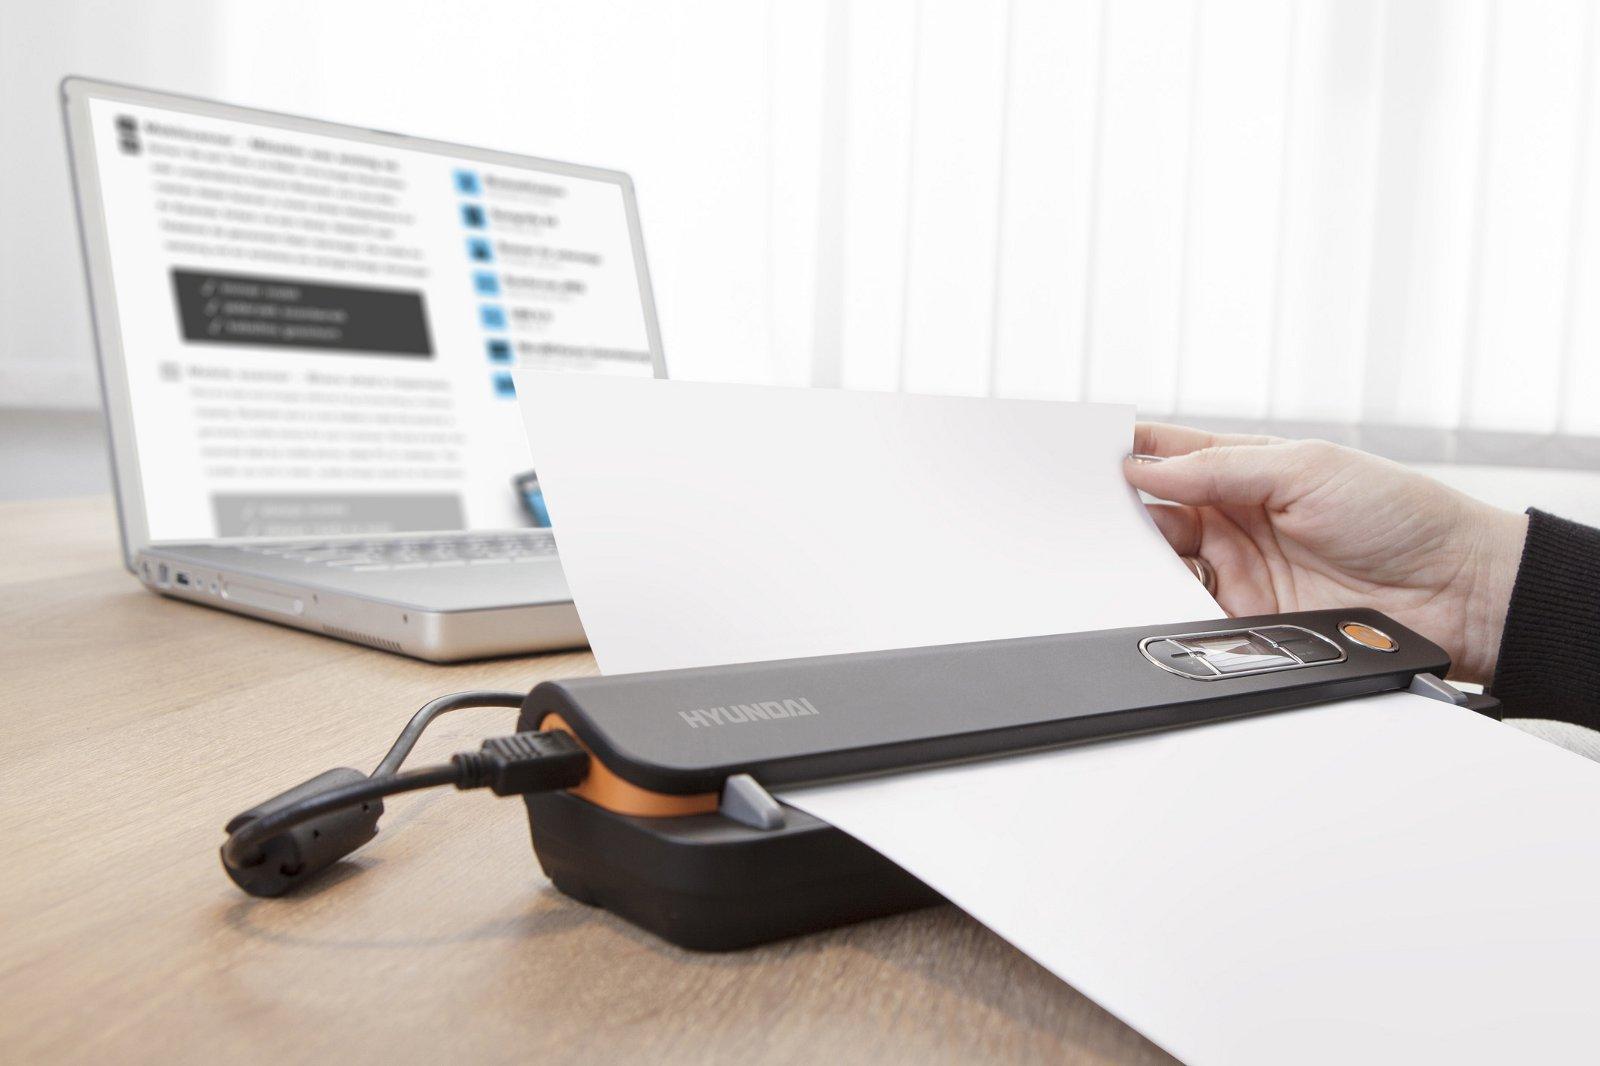 hyundai scan o meter portable scanner 600 300 dots per inch usb 2 0 black. Black Bedroom Furniture Sets. Home Design Ideas